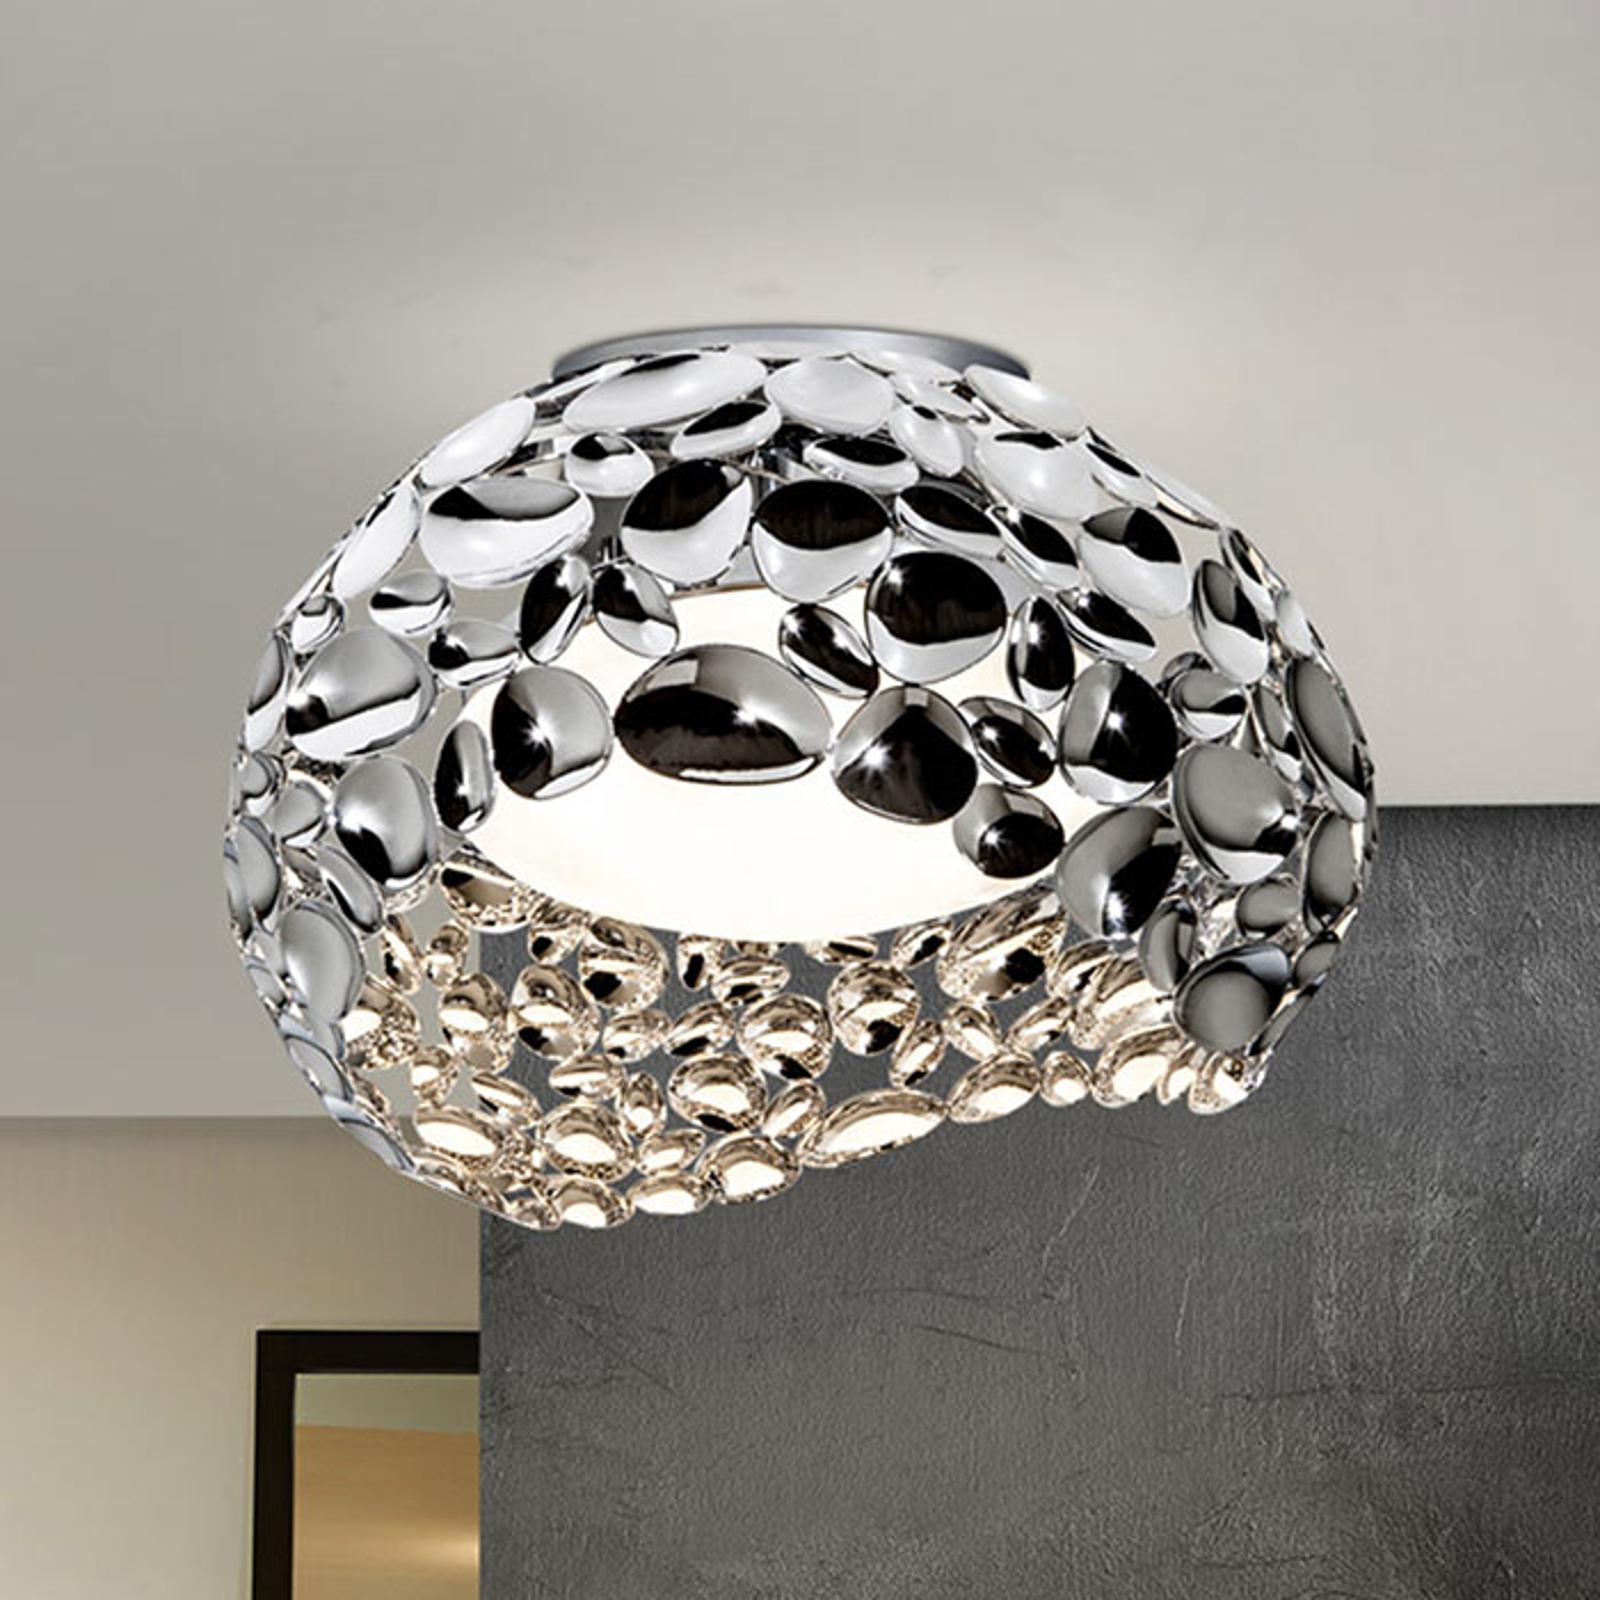 Lampa sufitowa LED Narisa, Ø 46 cm, chrom